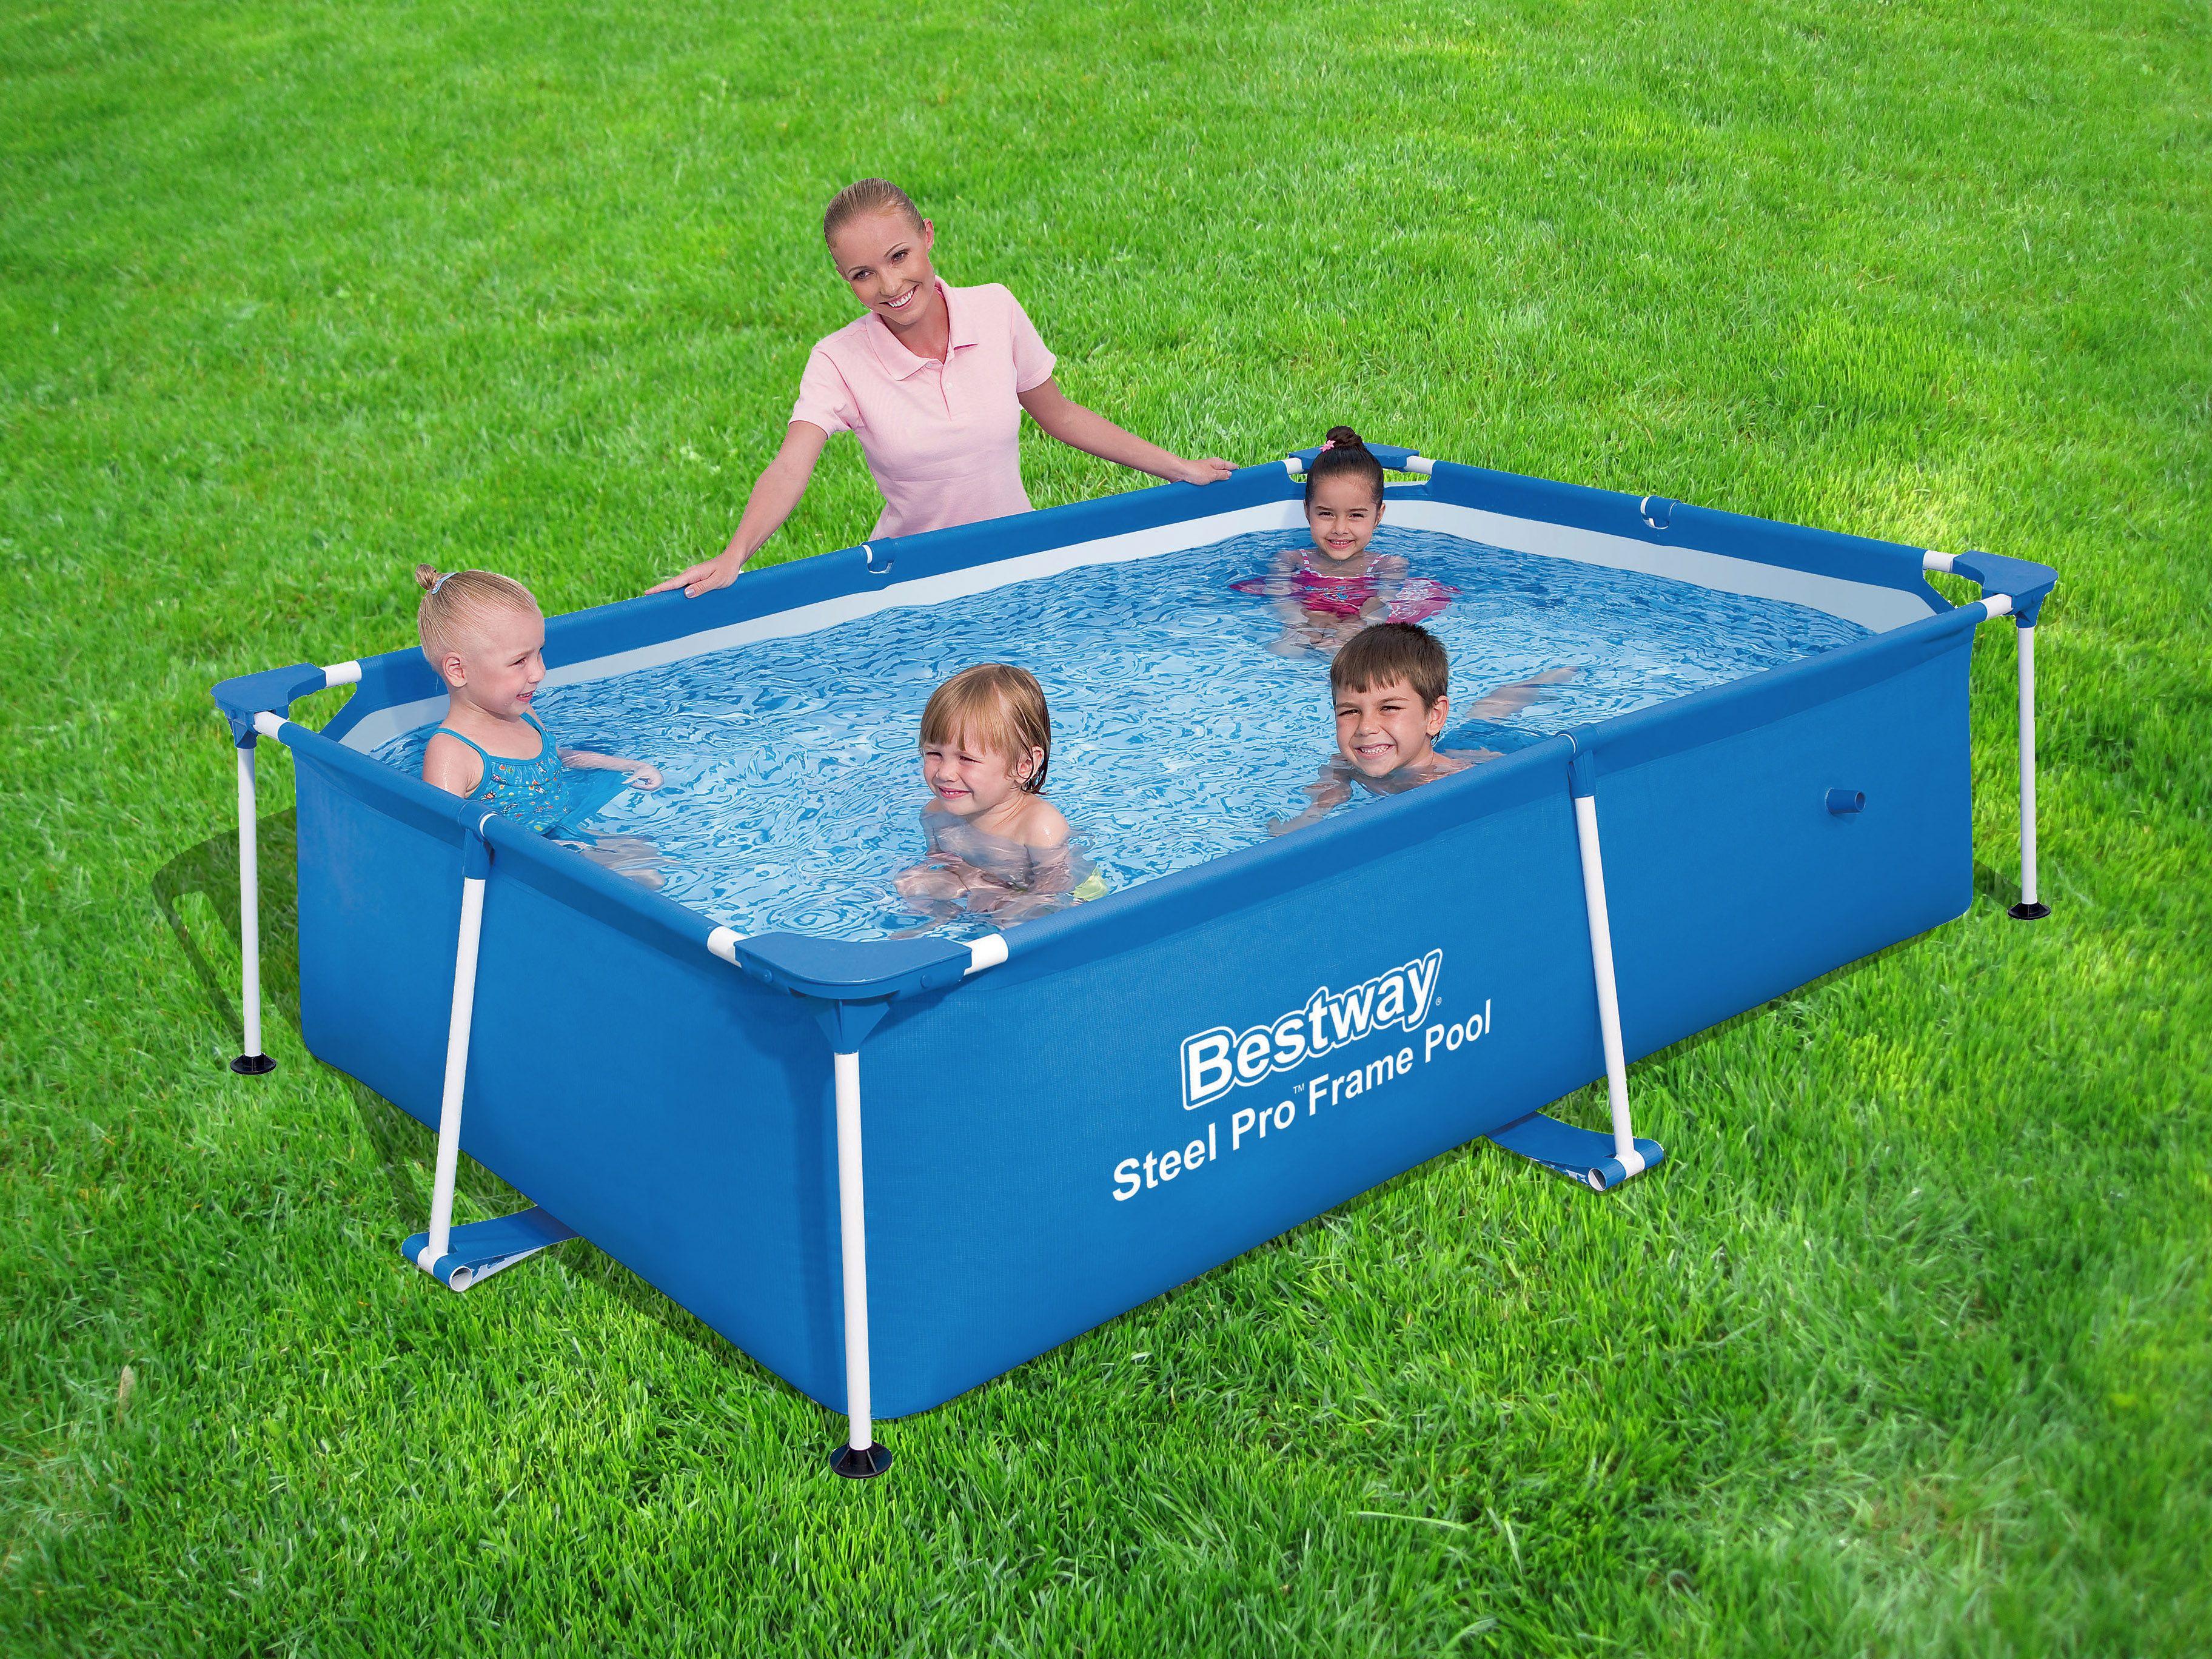 Fun Little Pool For The Kiddos Children Swimming Pool Kids